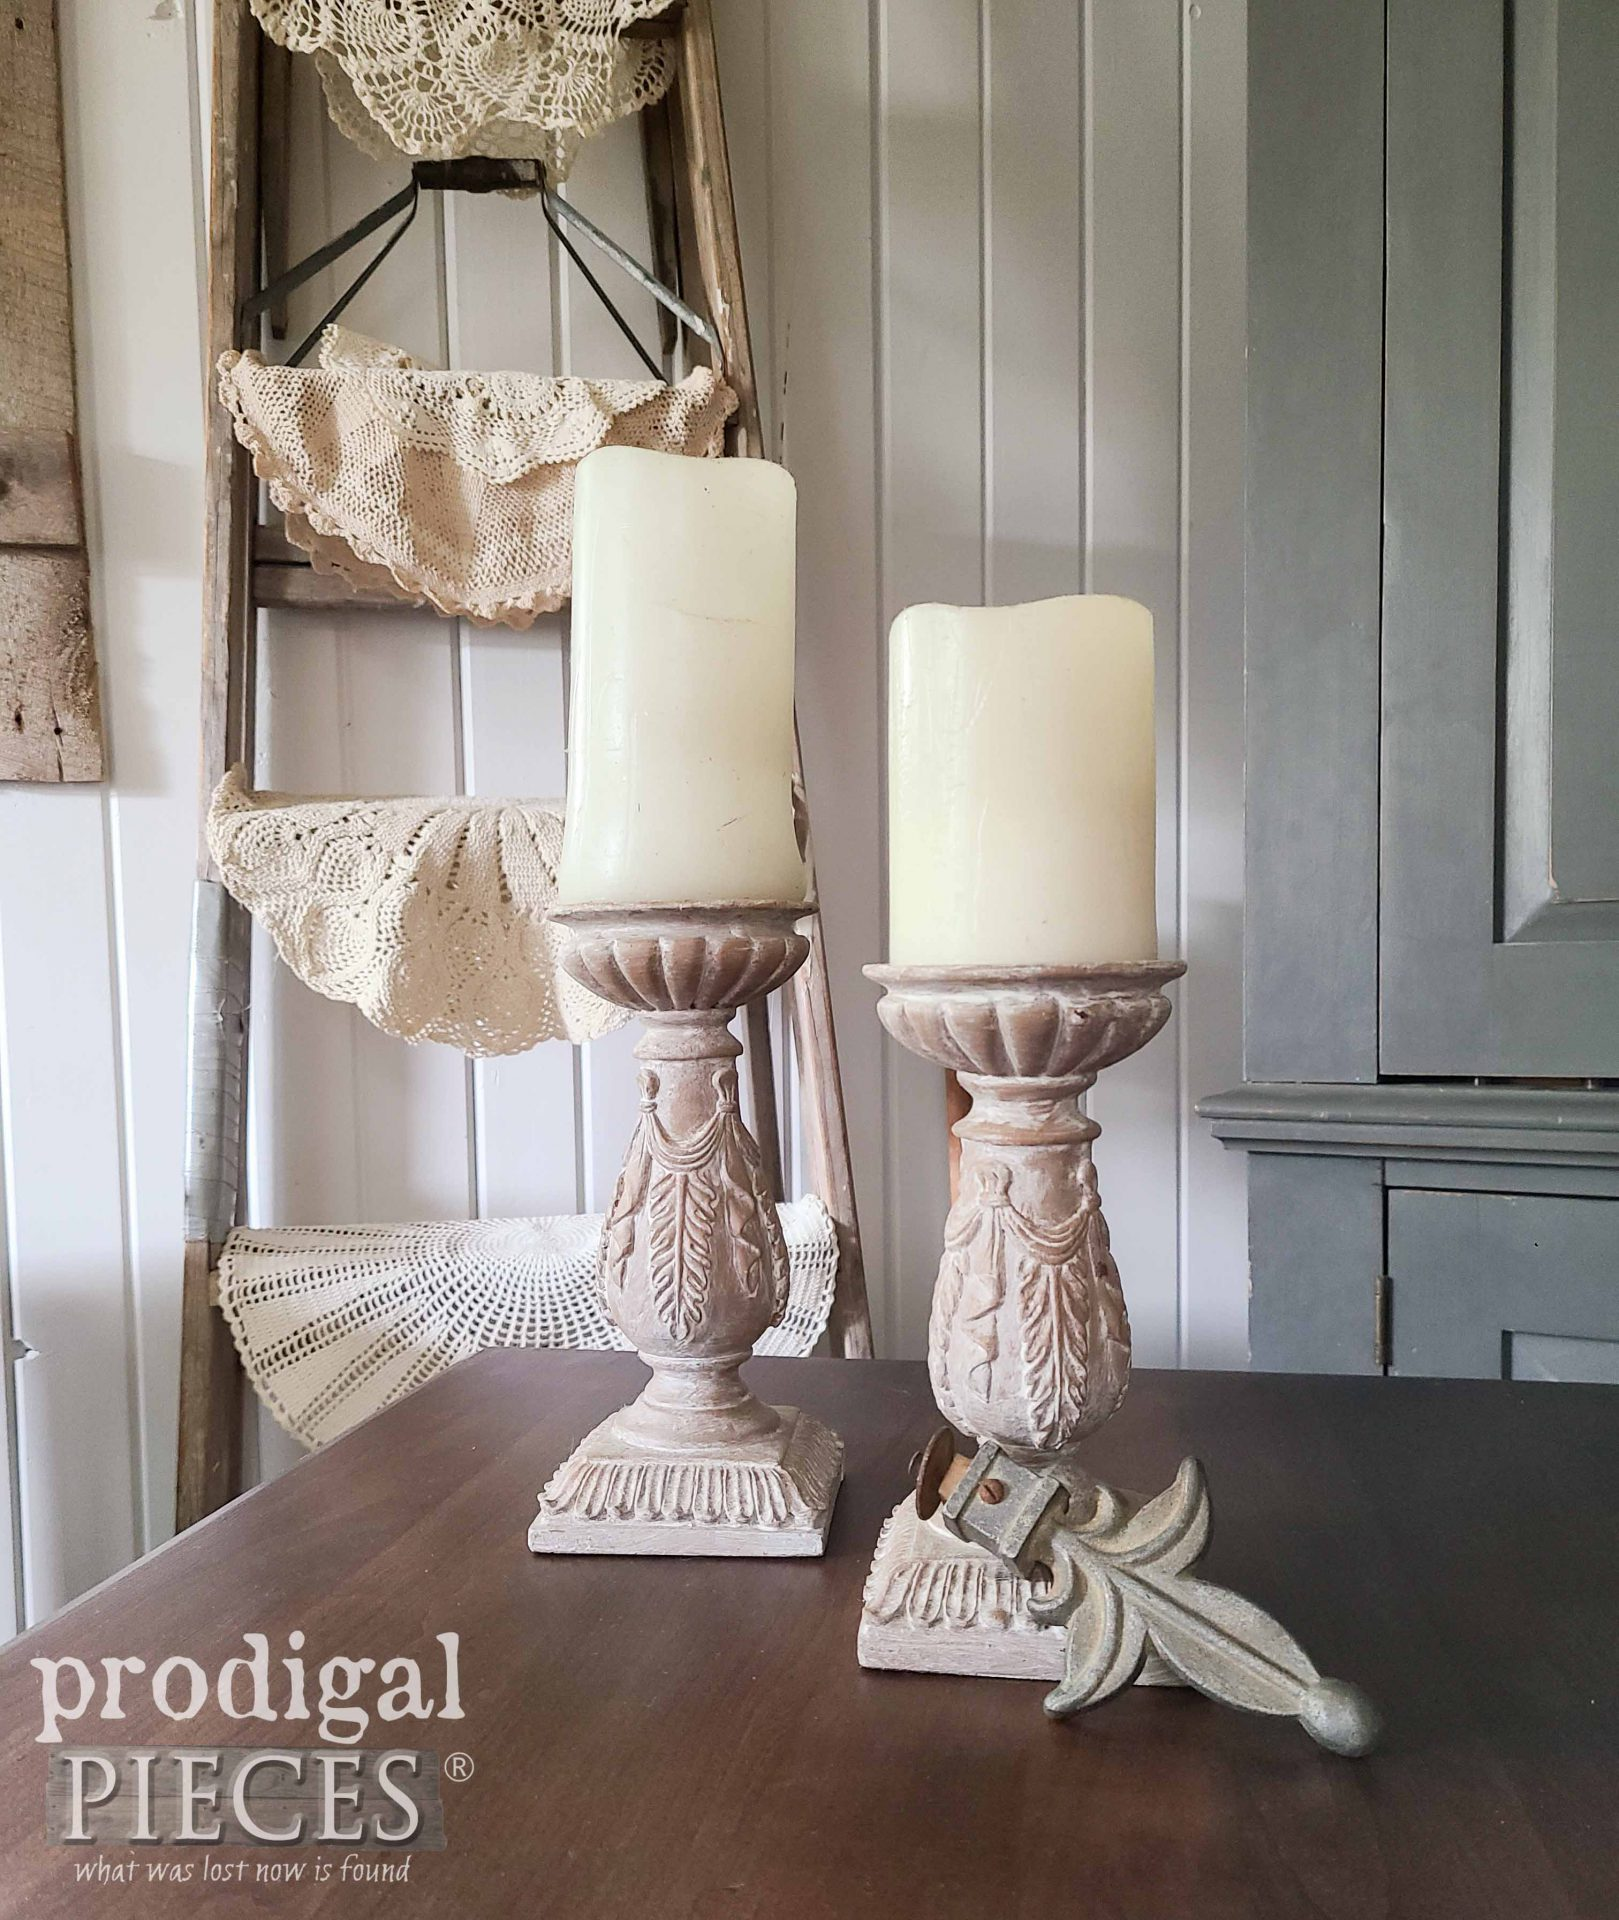 Farmhouse Decor on Side Table | Prodigal Pieces | prodigalpieces.com #prodigalpieces #home #vintage #decor #farmhouse